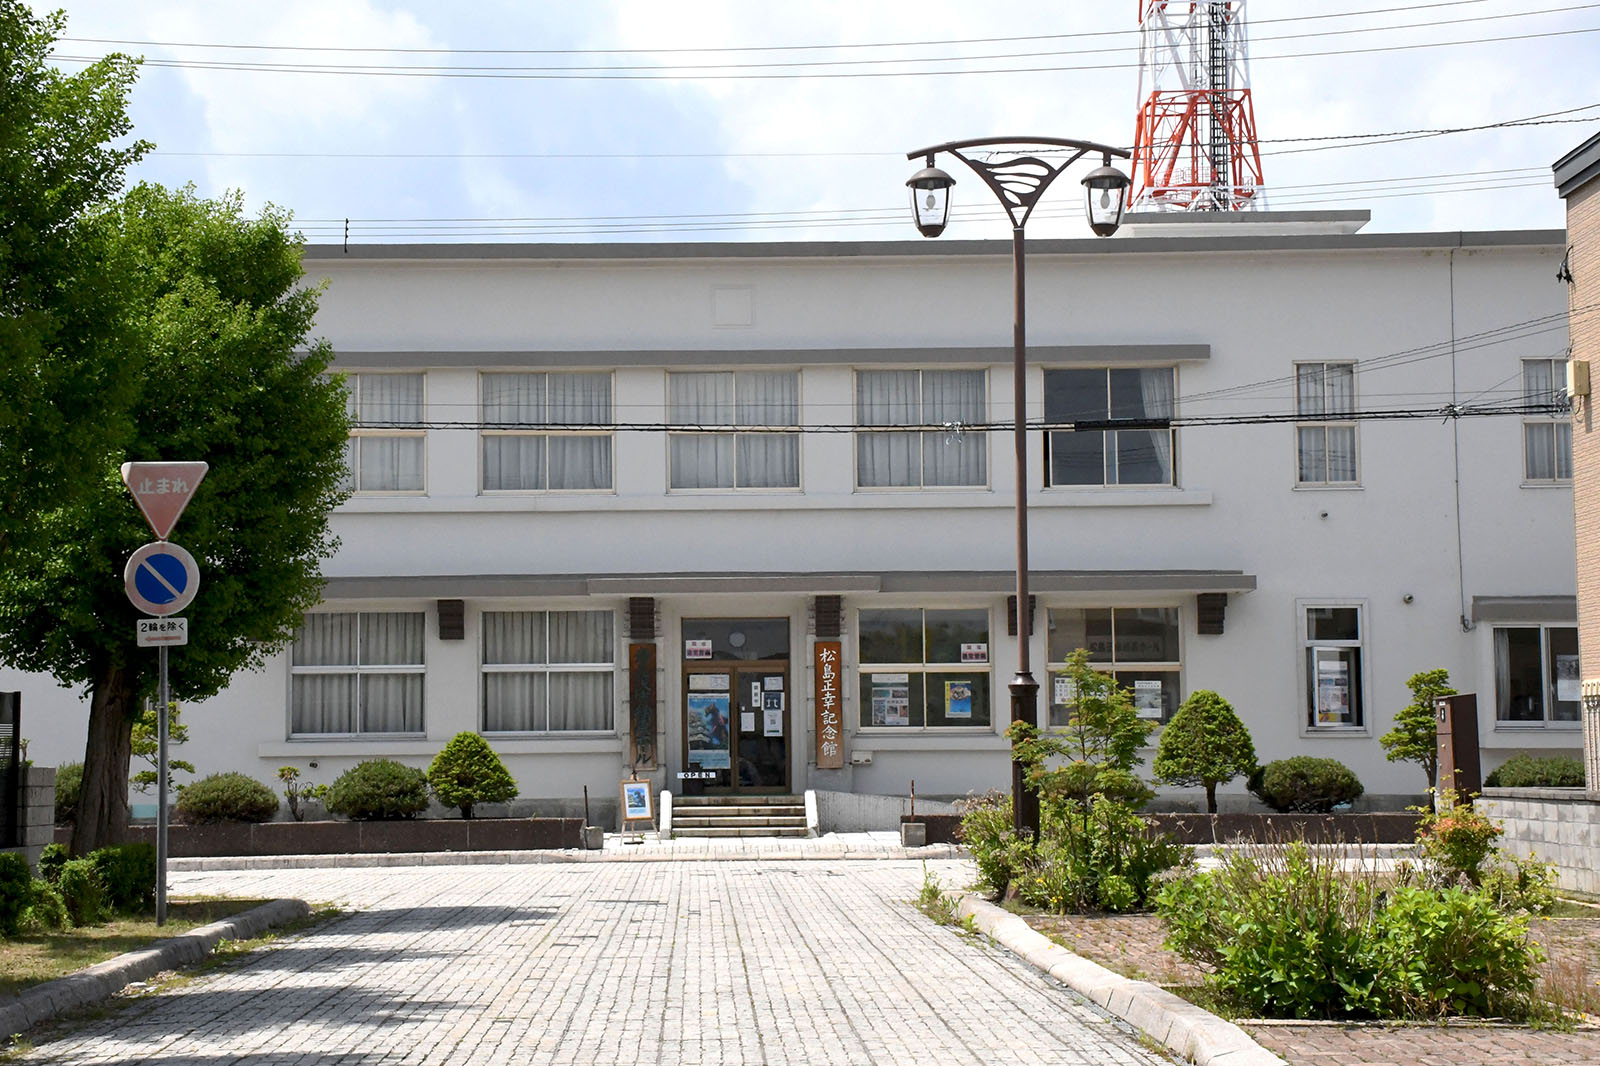 岩見沢市絵画ホール ・ 松島正幸記念館